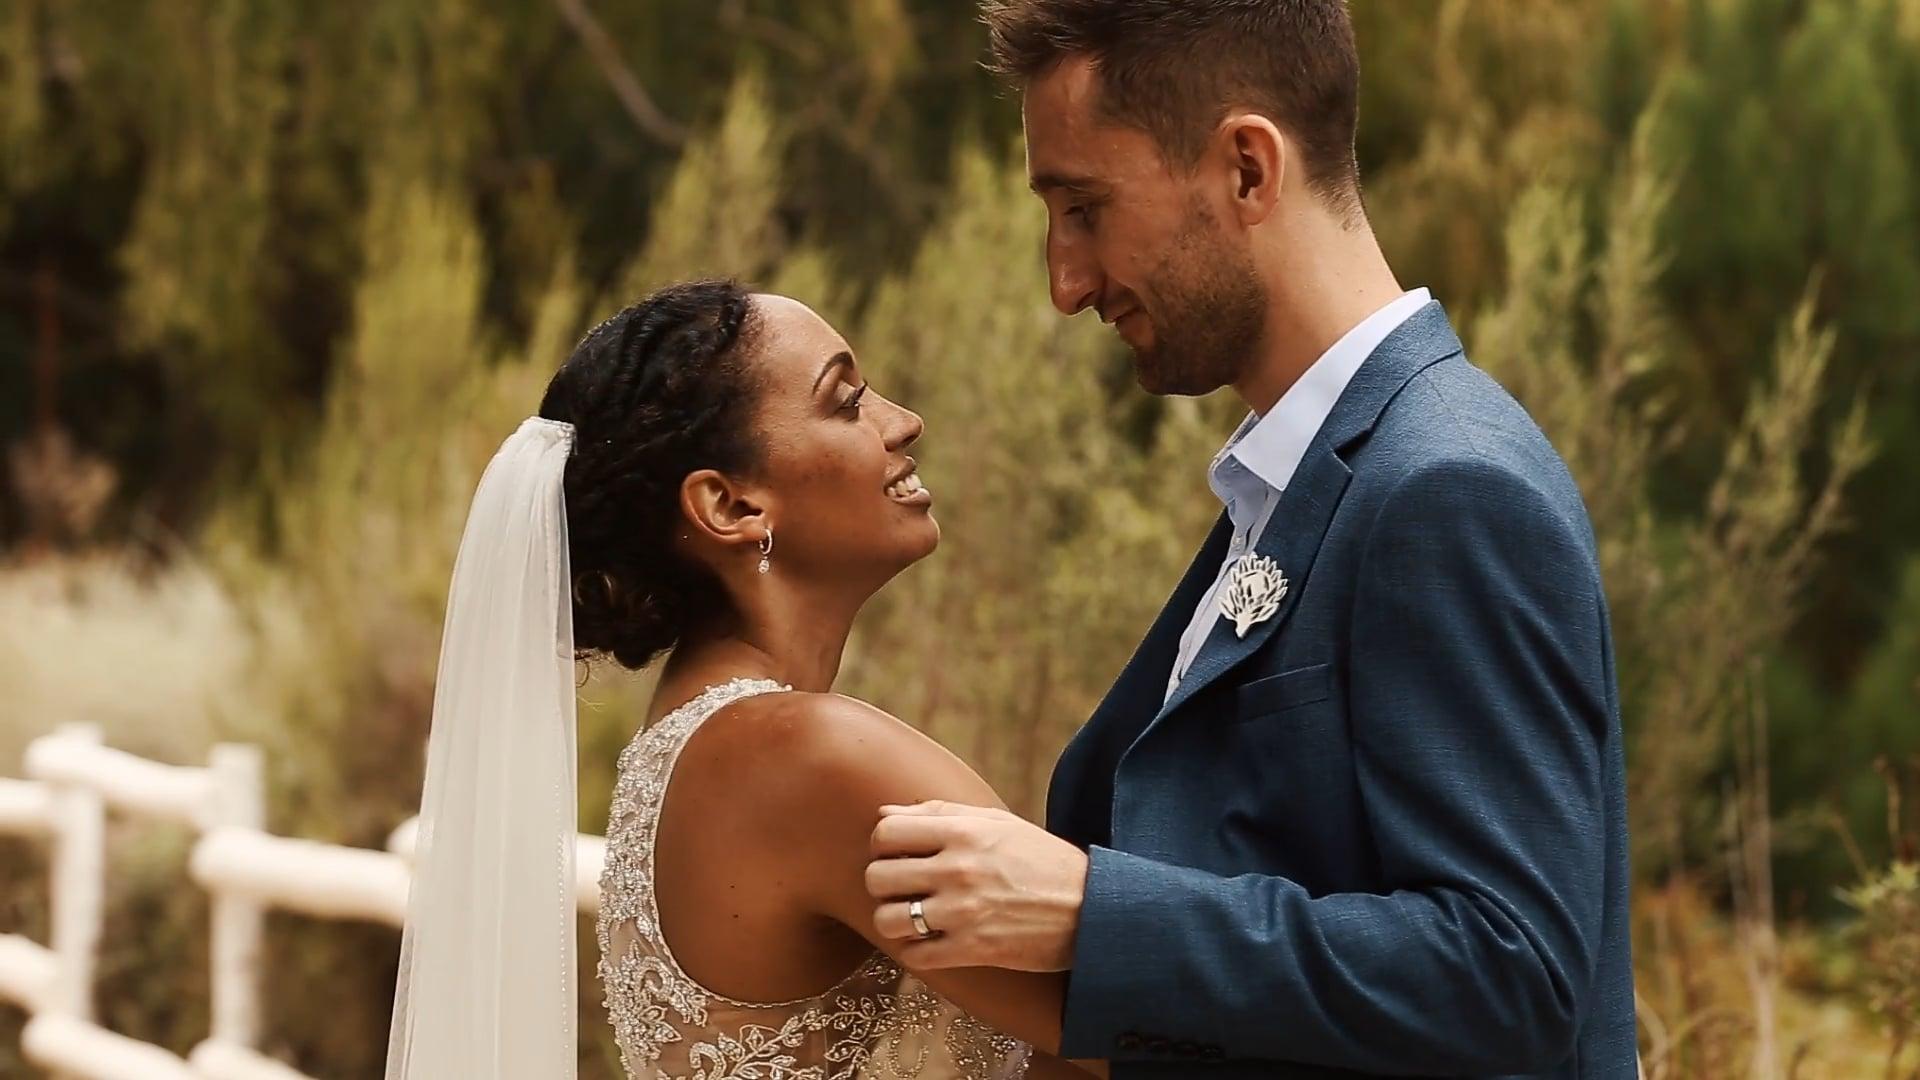 John and Nastassja wedding preview, Old Mac Daddy, Elgin - 09 March 2019